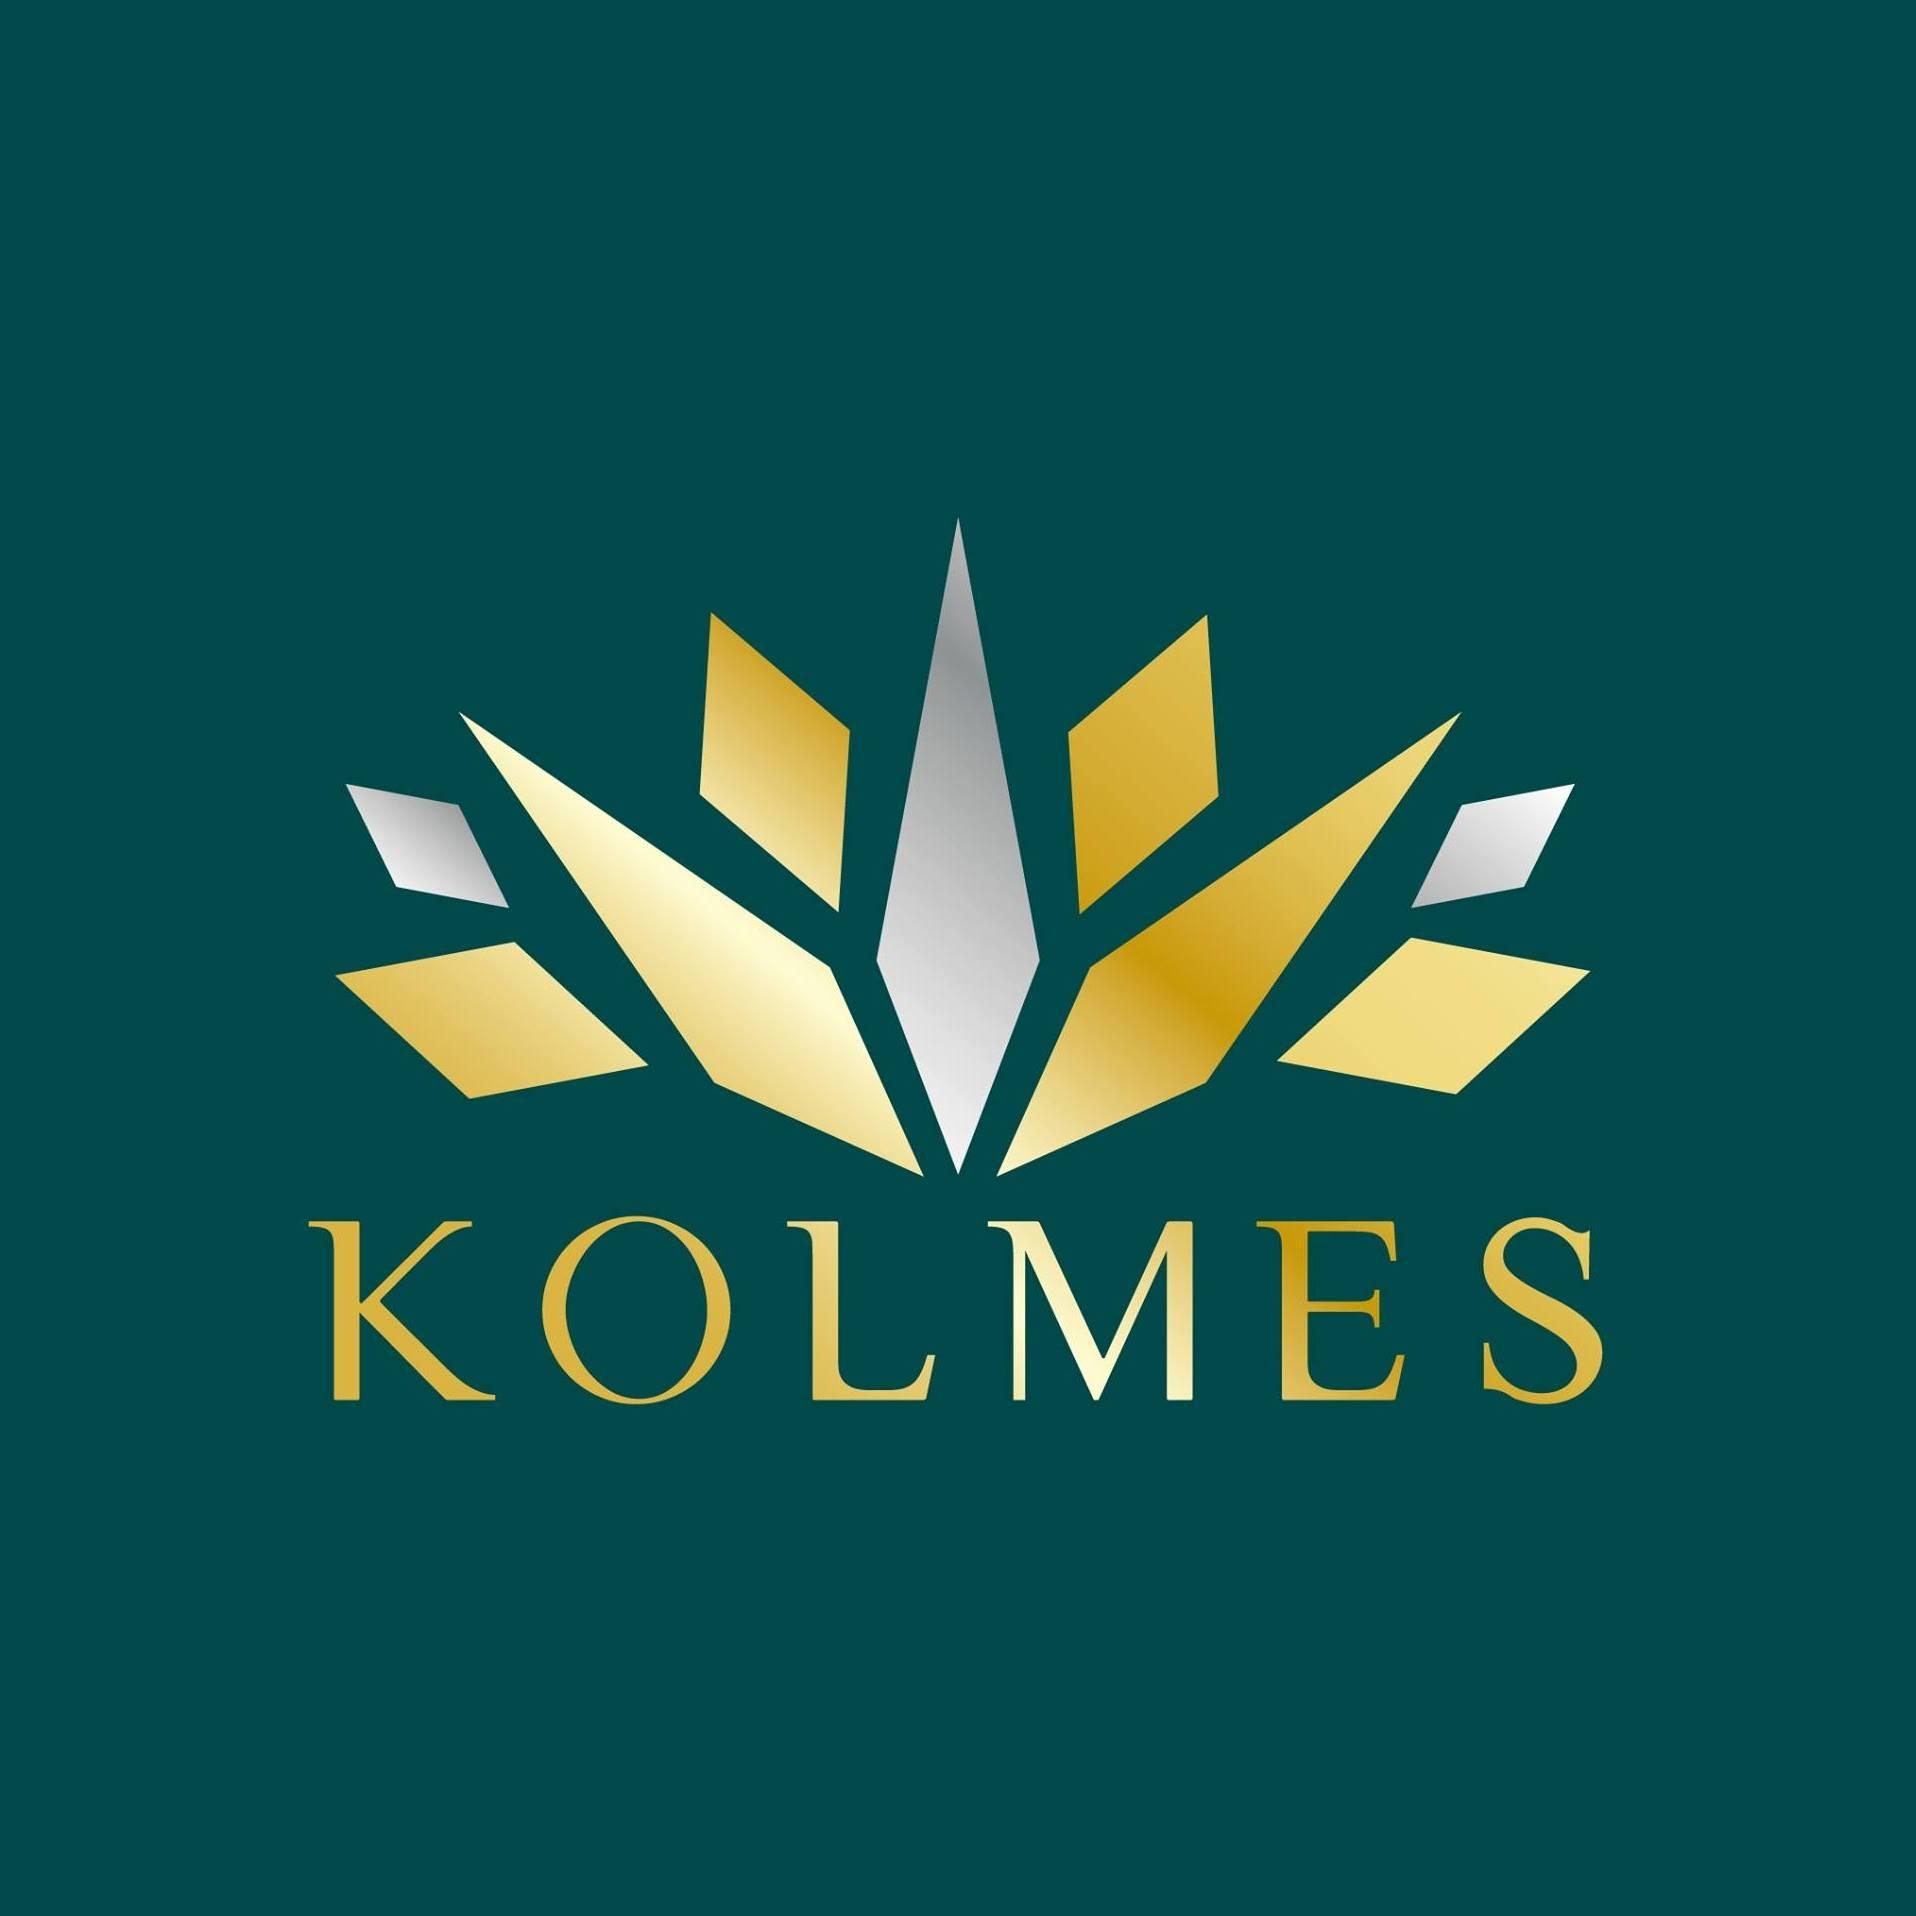 KOLMES